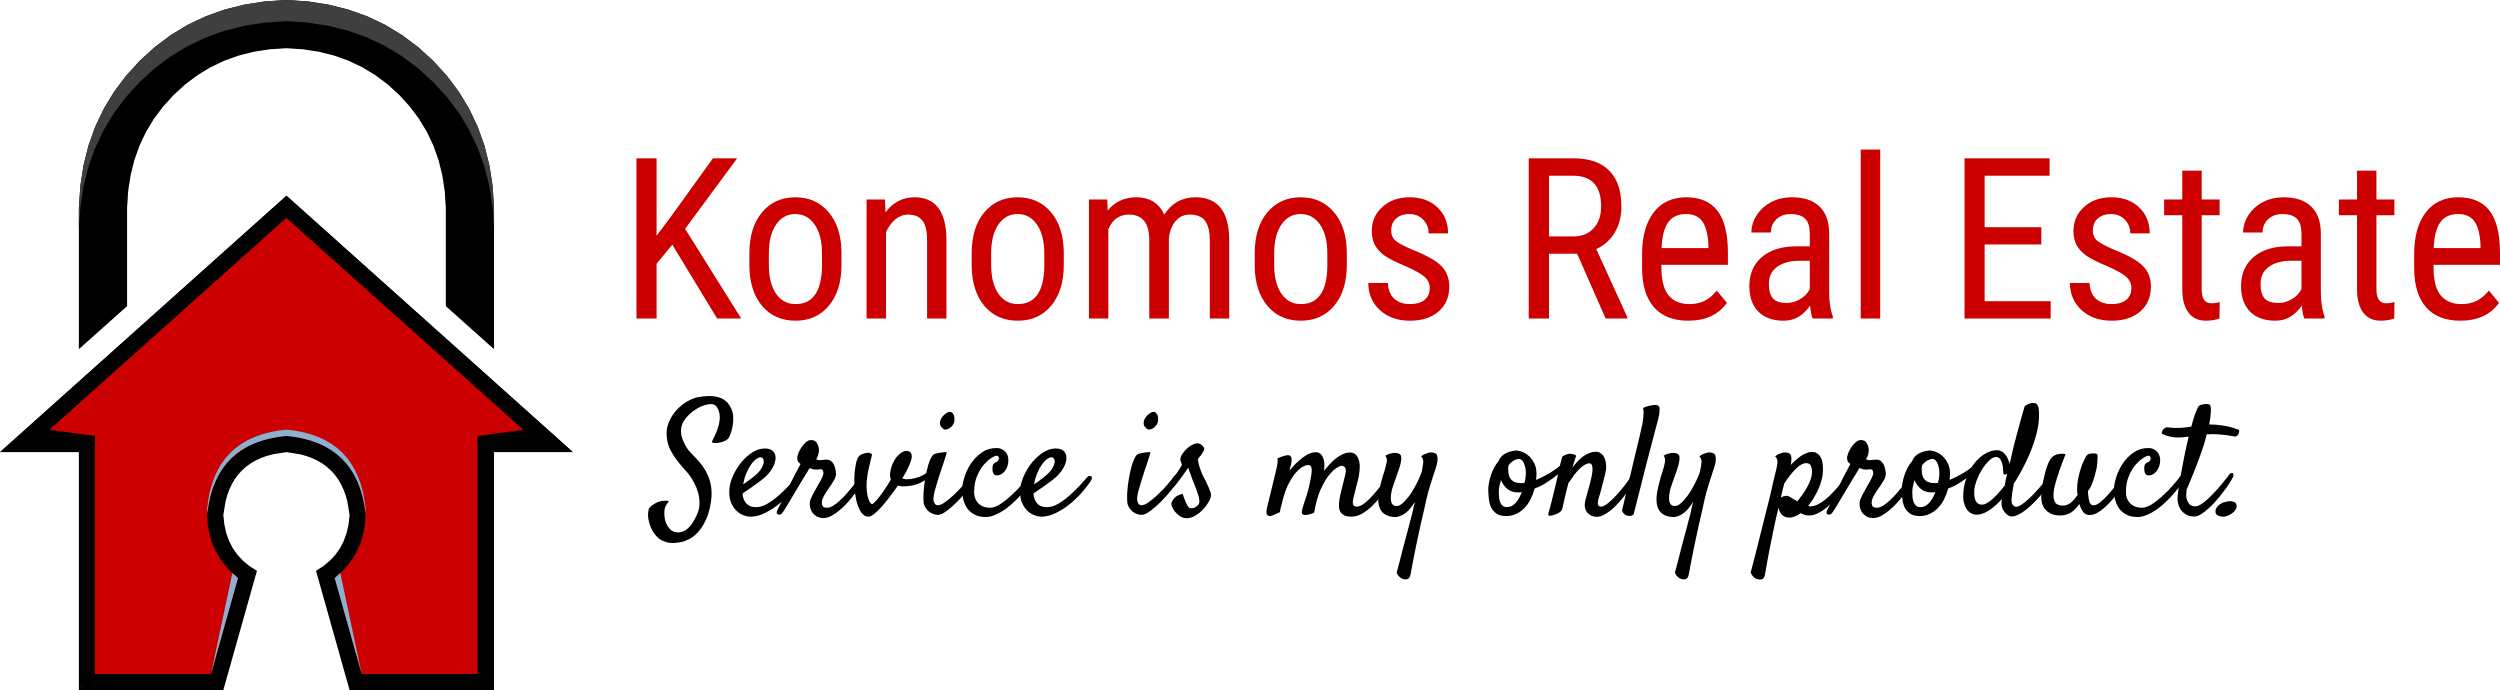 Konomos Real Estate